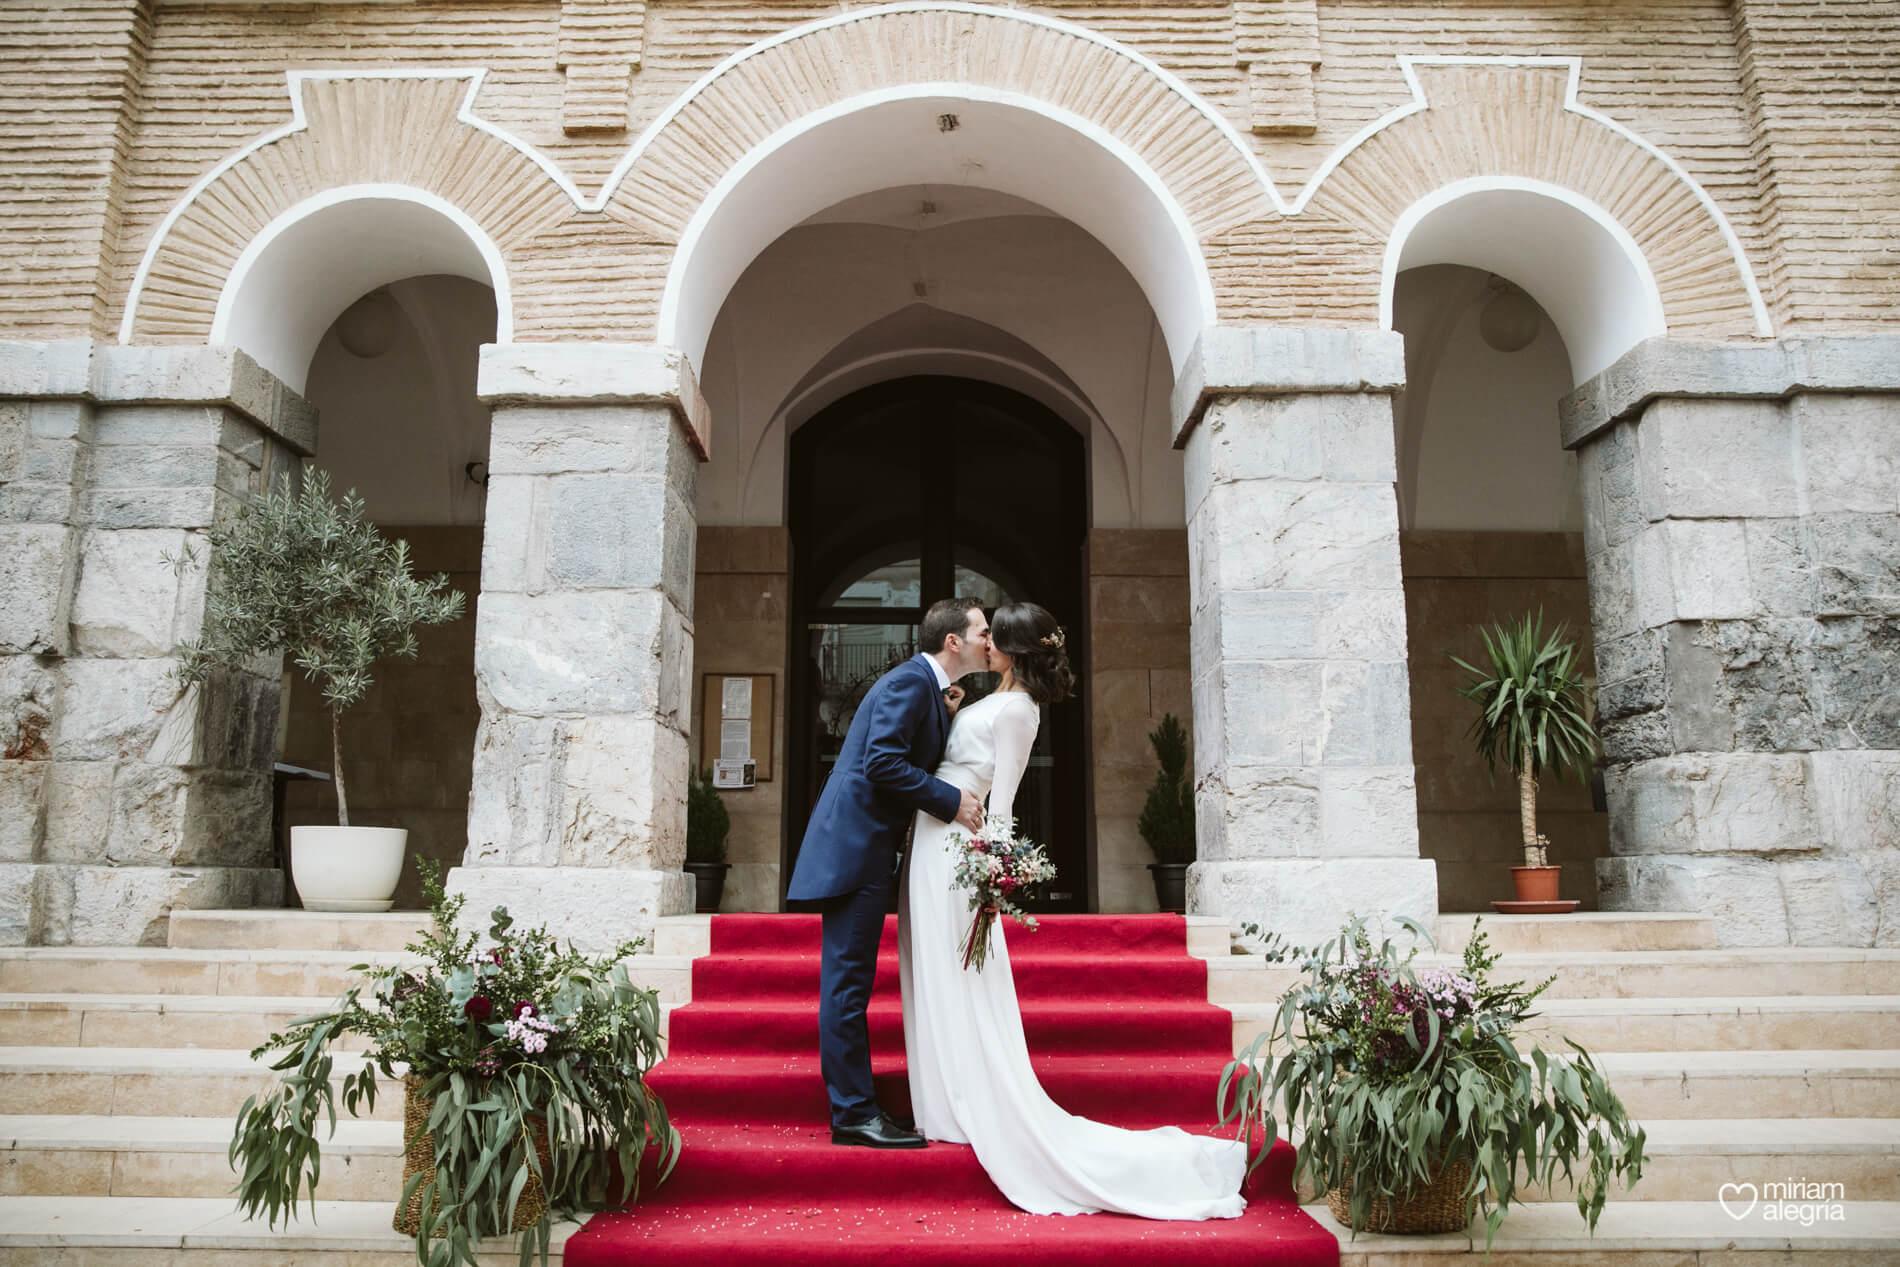 boda-en-iglesia-del-carmen-cartagena-118